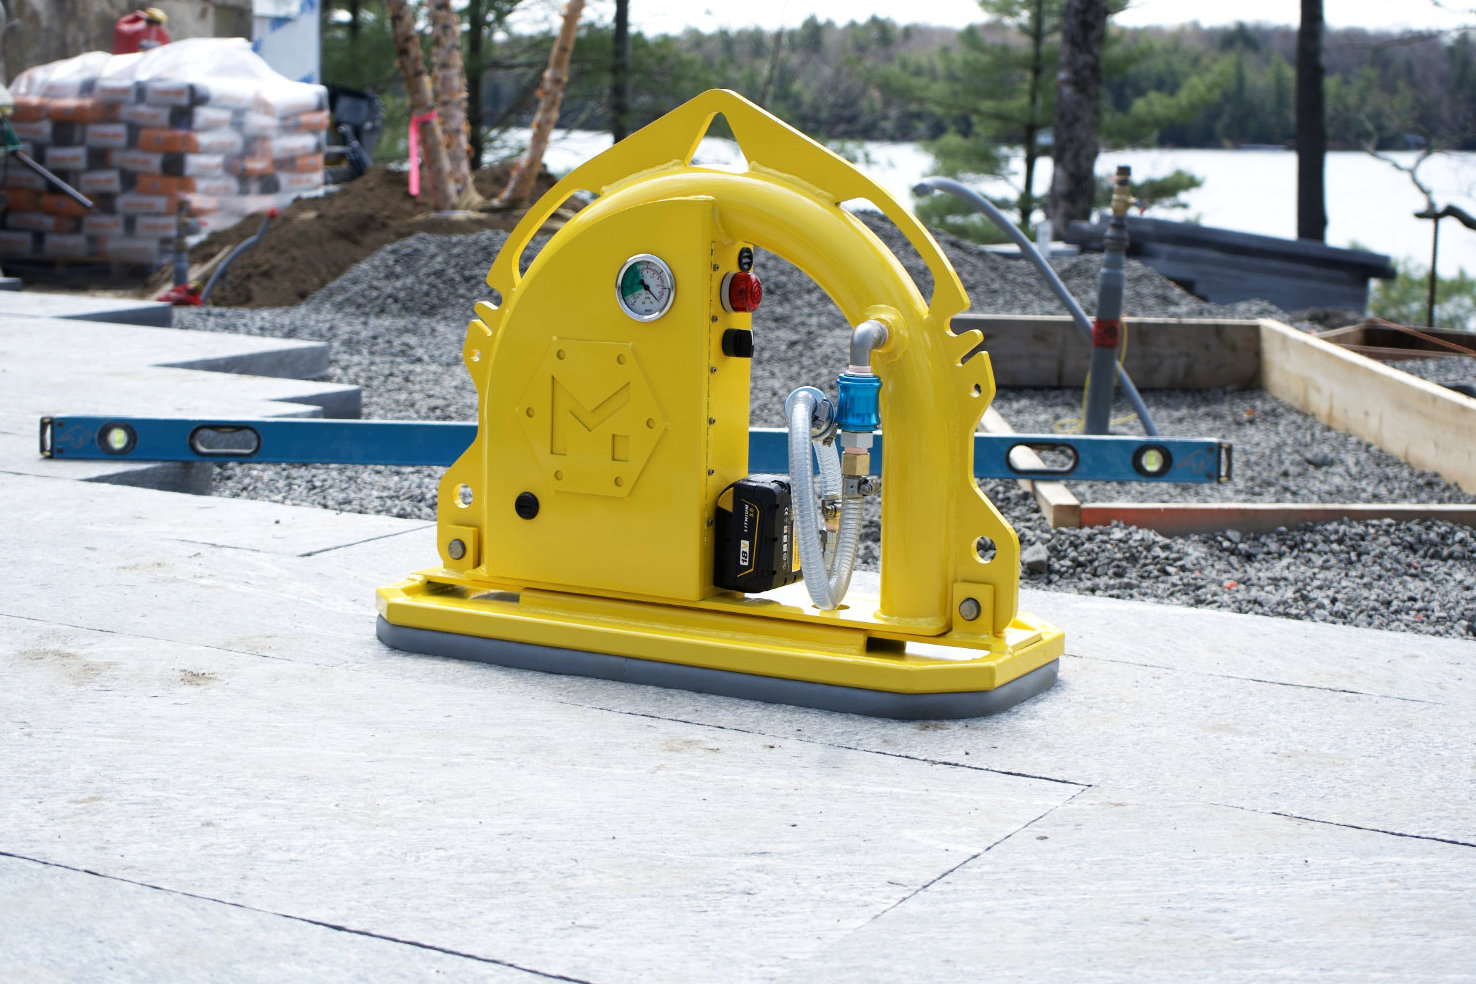 MQUIP Mini Mk2 vacuum lifter sitting on stone.